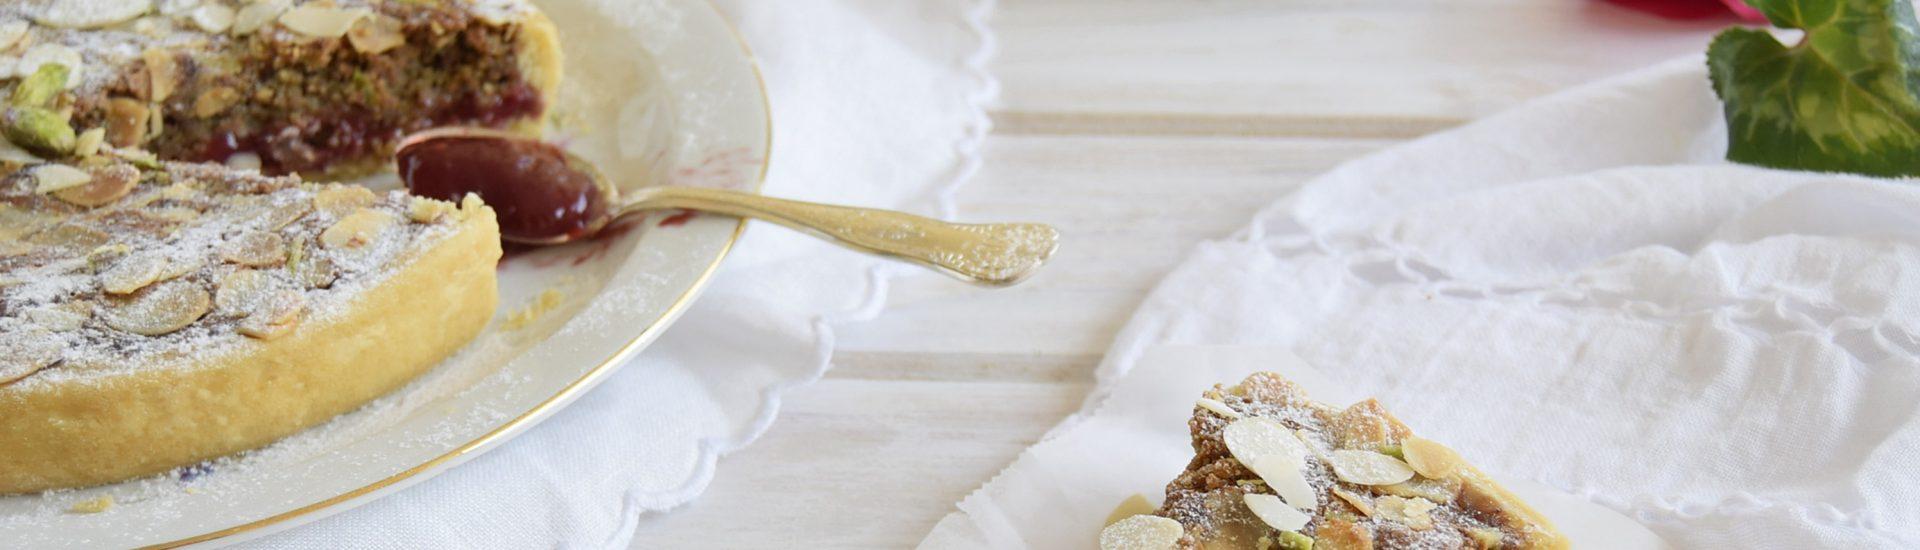 Bakewell tart con pistacchi